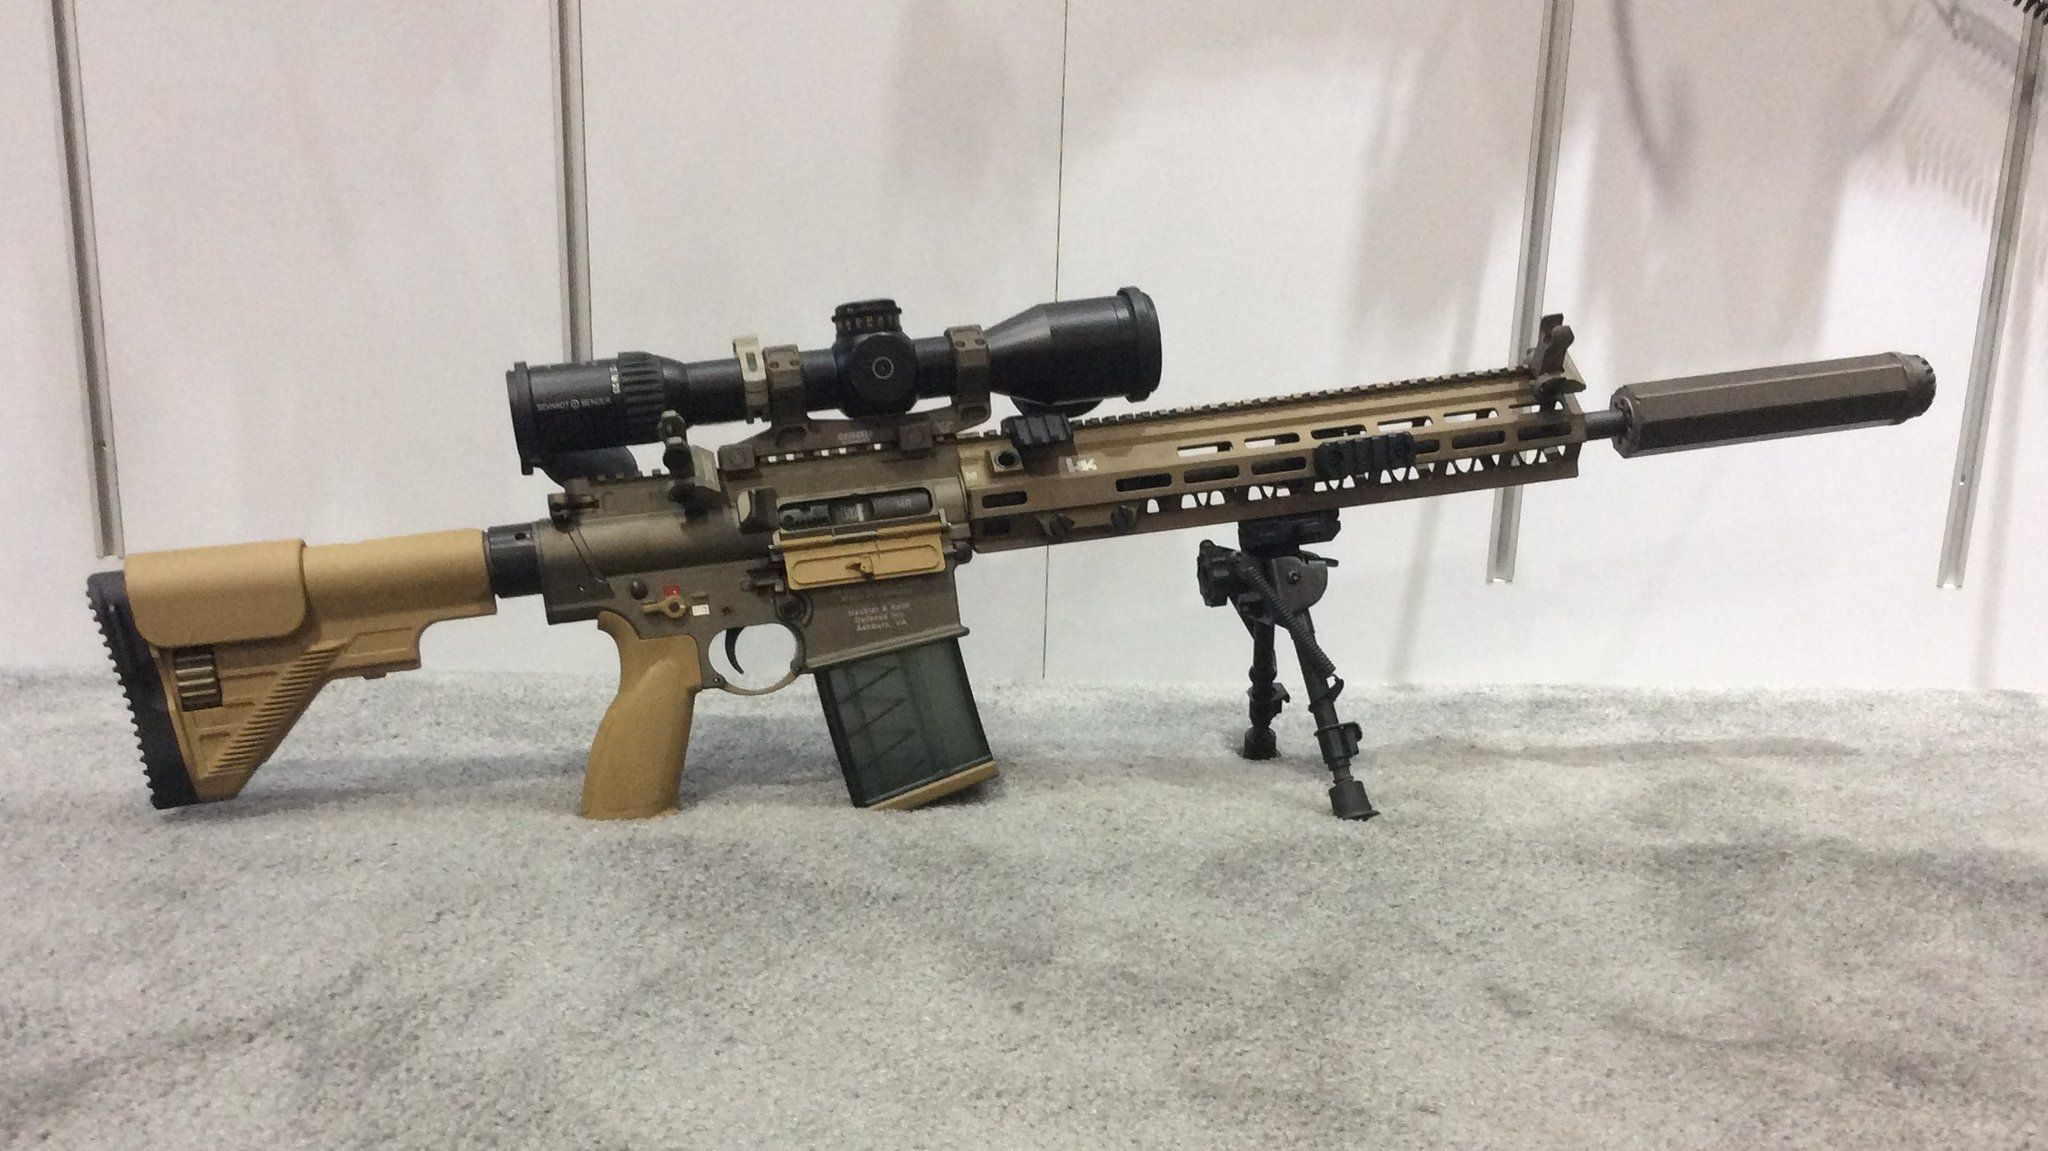 HK MR762 SDMR / M110A1 Clone-4f295089-d0e0-41ce-8ddc-ef6a36c839cc_1549237025152.jpeg